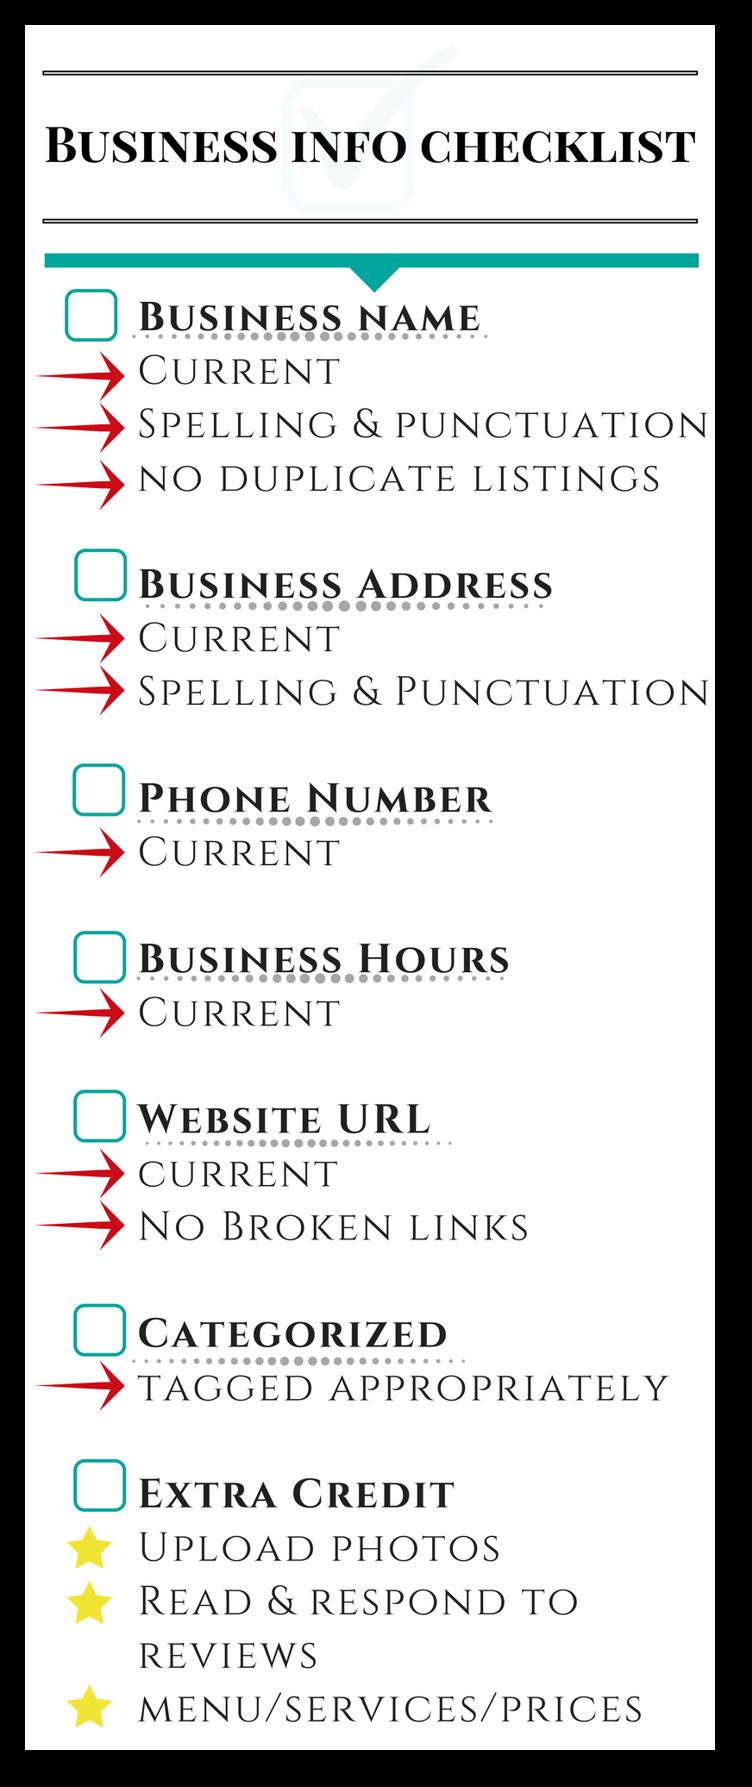 Business info checklist infographic